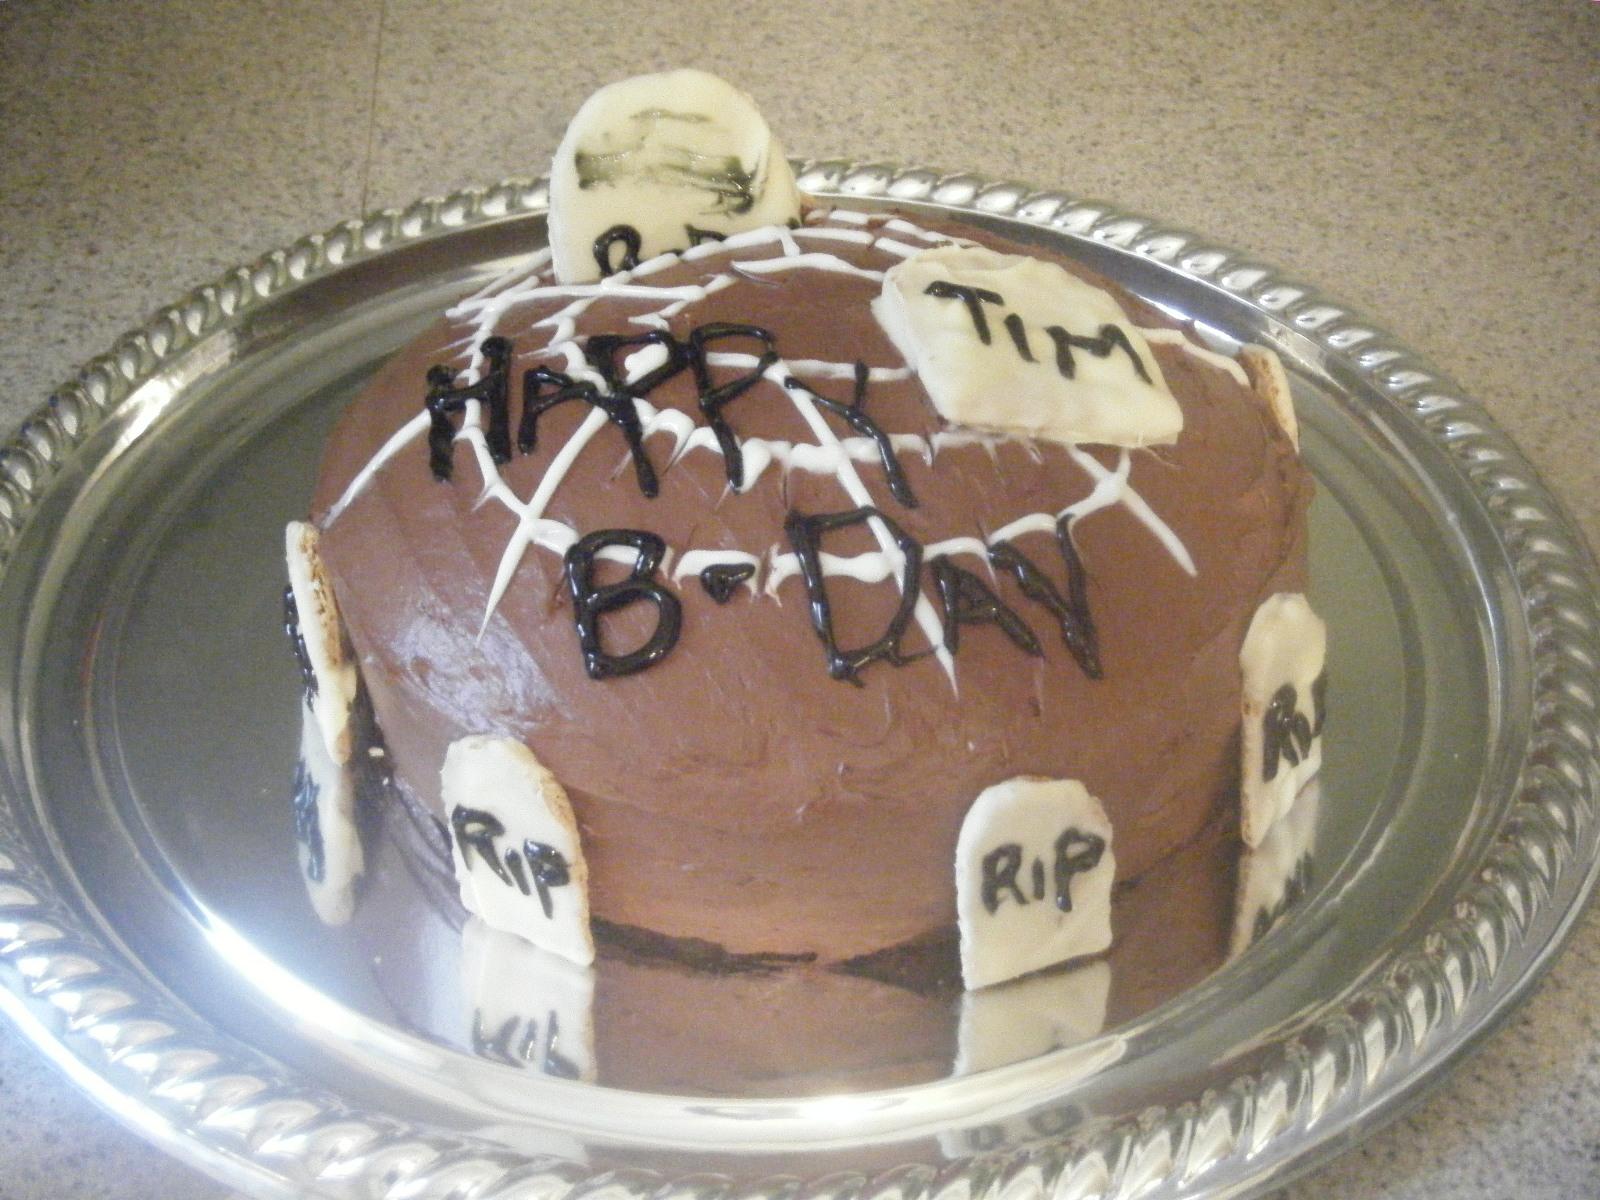 The Embody Family Happy Birthday To Tim